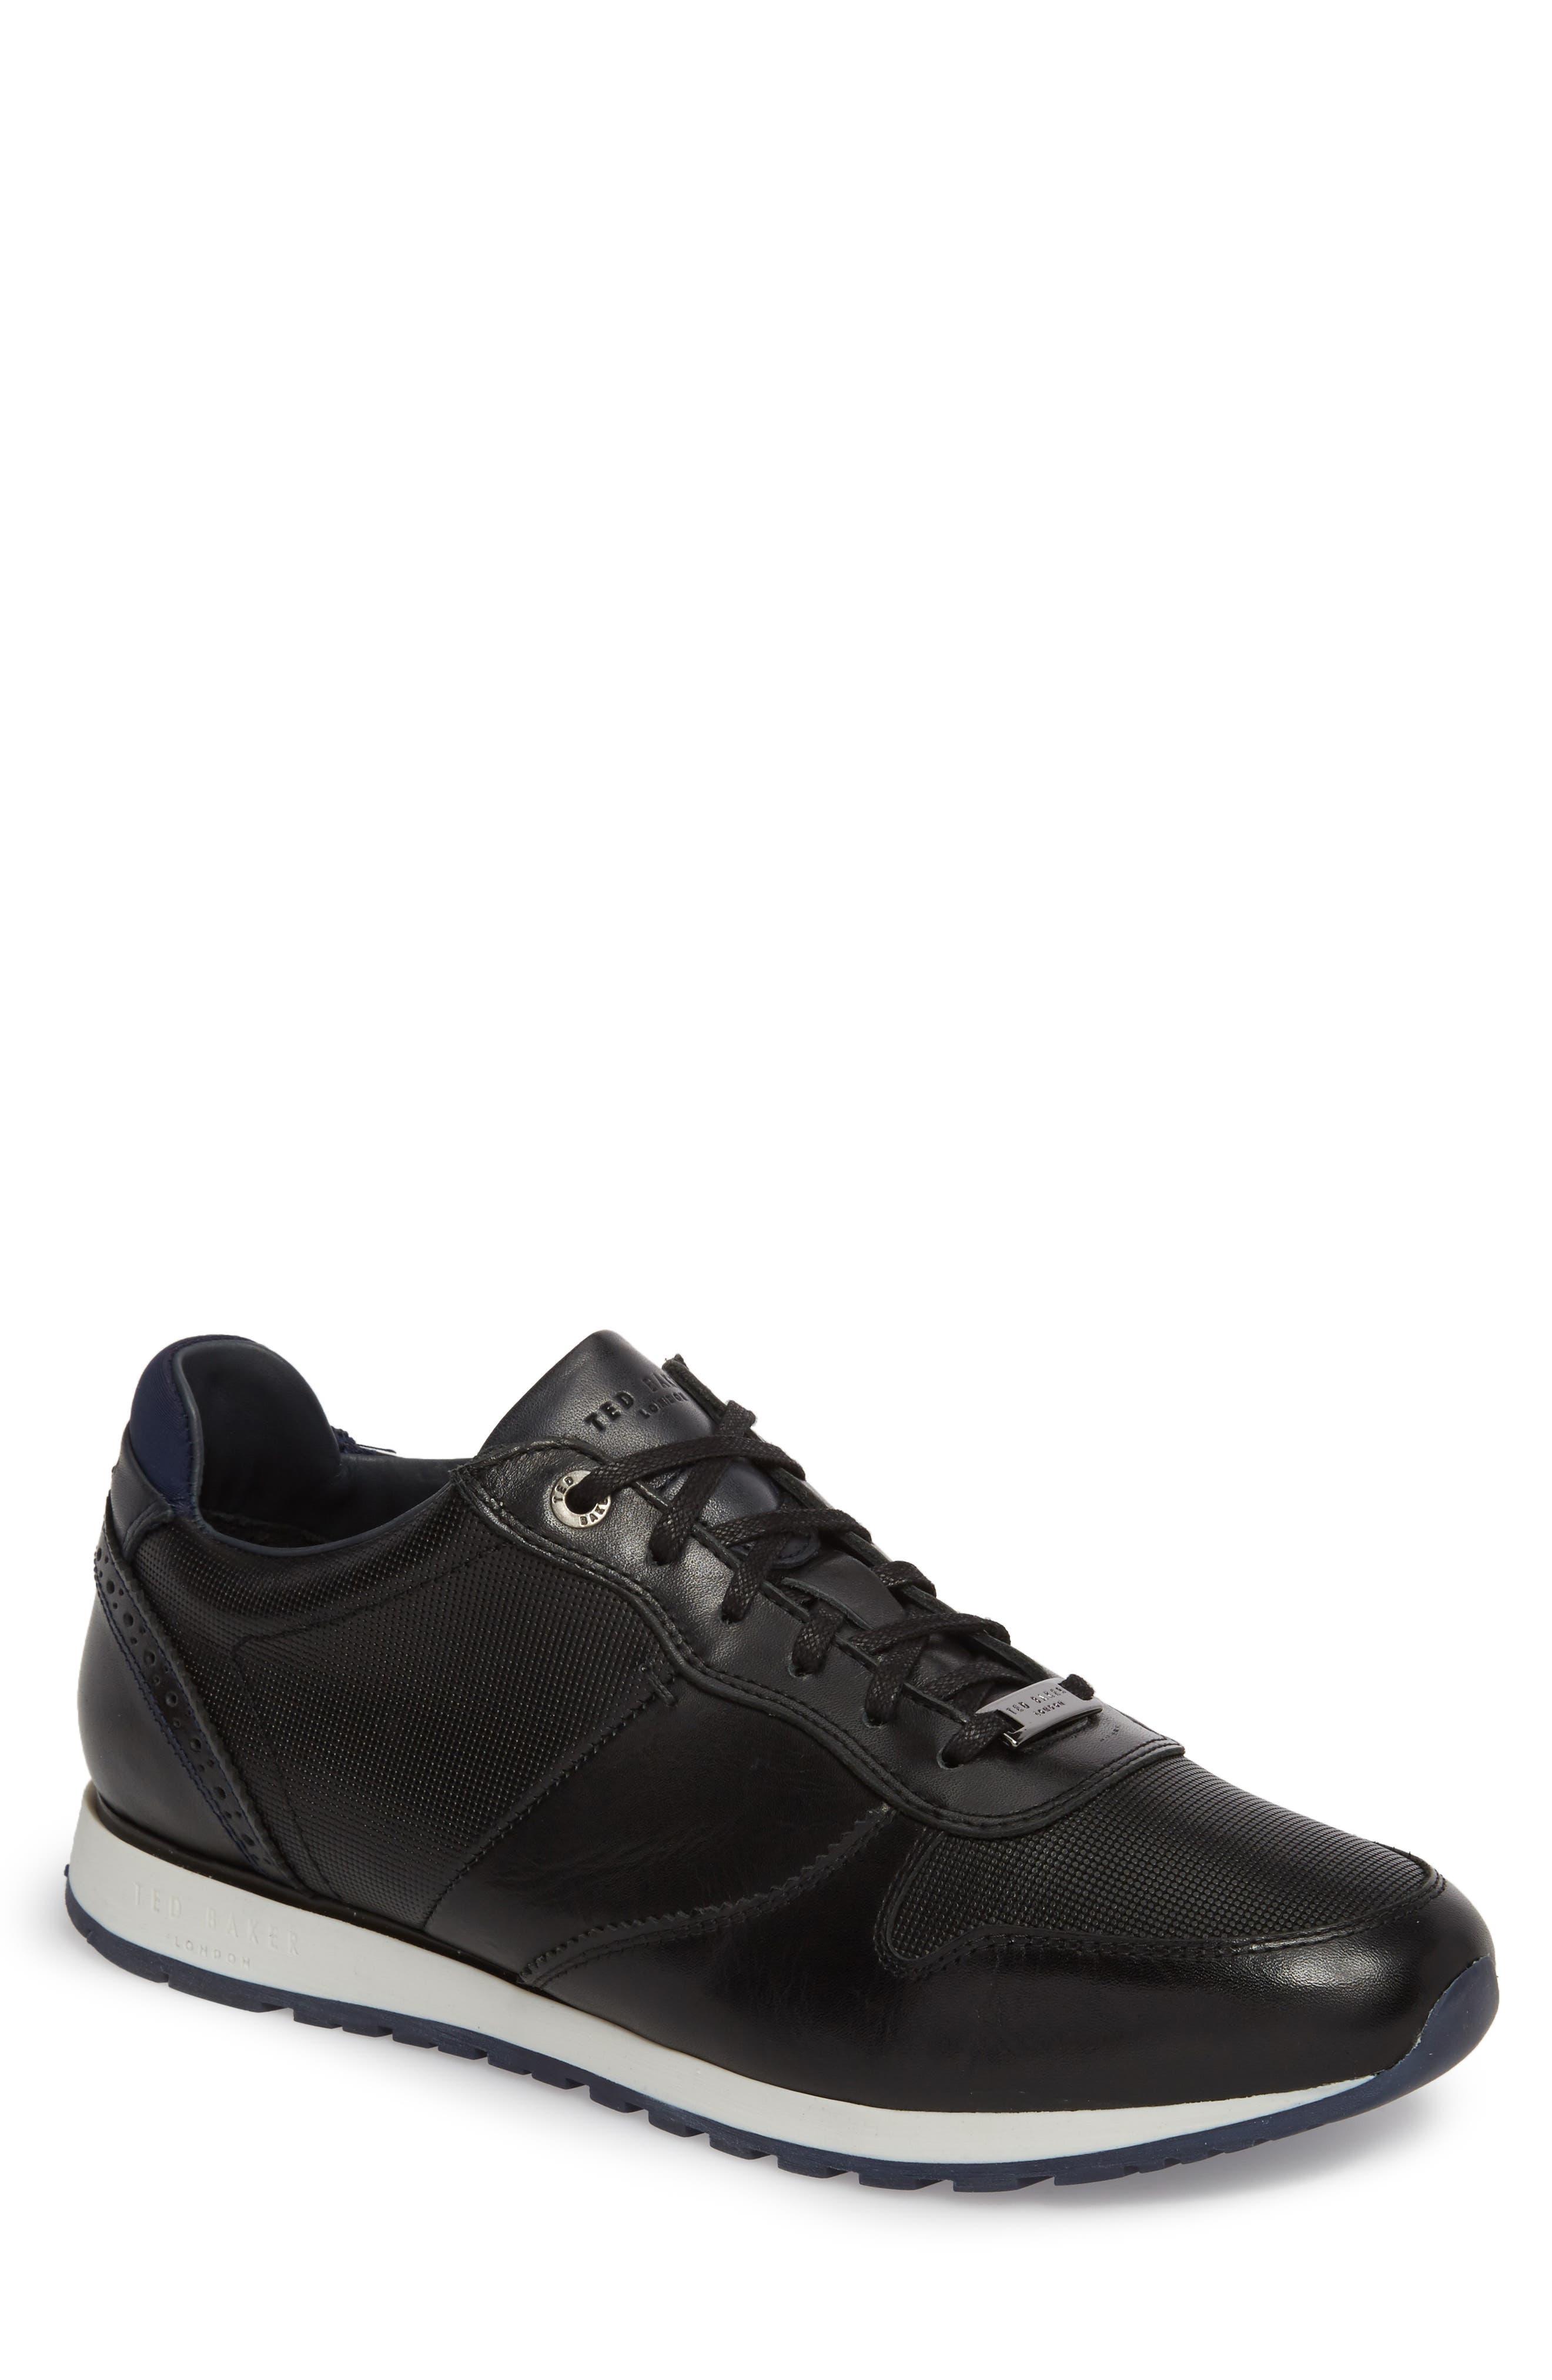 Shindl Sneaker,                             Main thumbnail 1, color,                             Black Leather